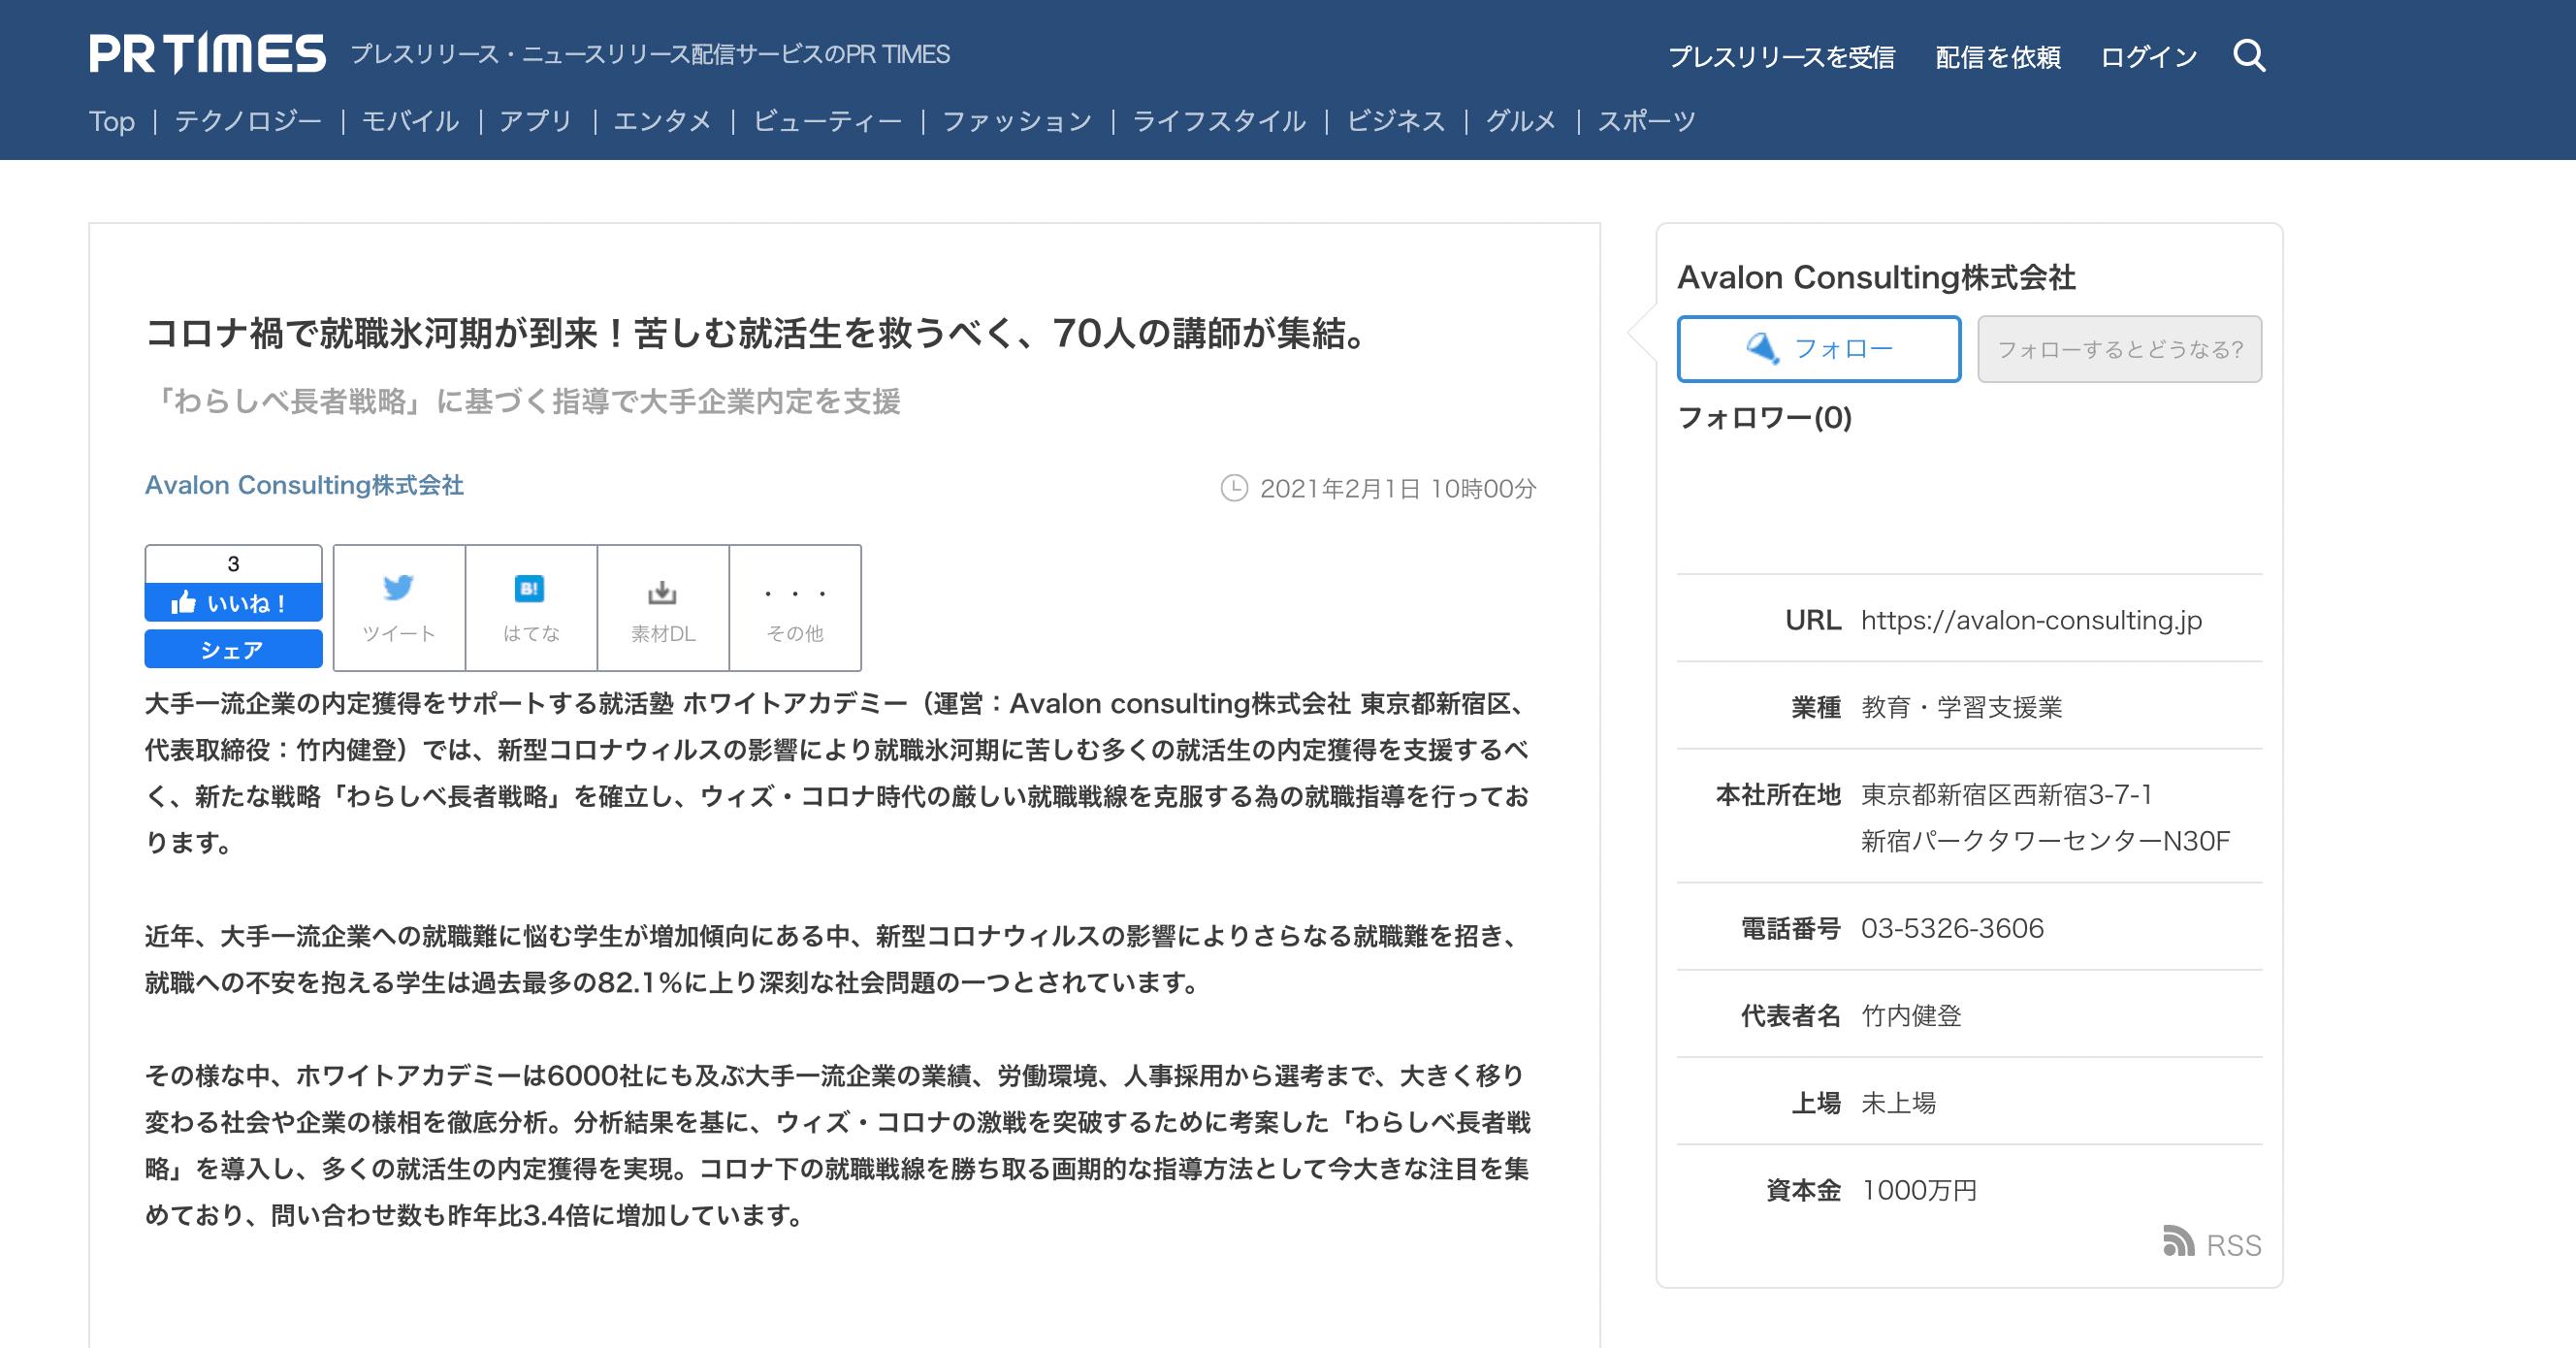 PRTimesでの紹介記事